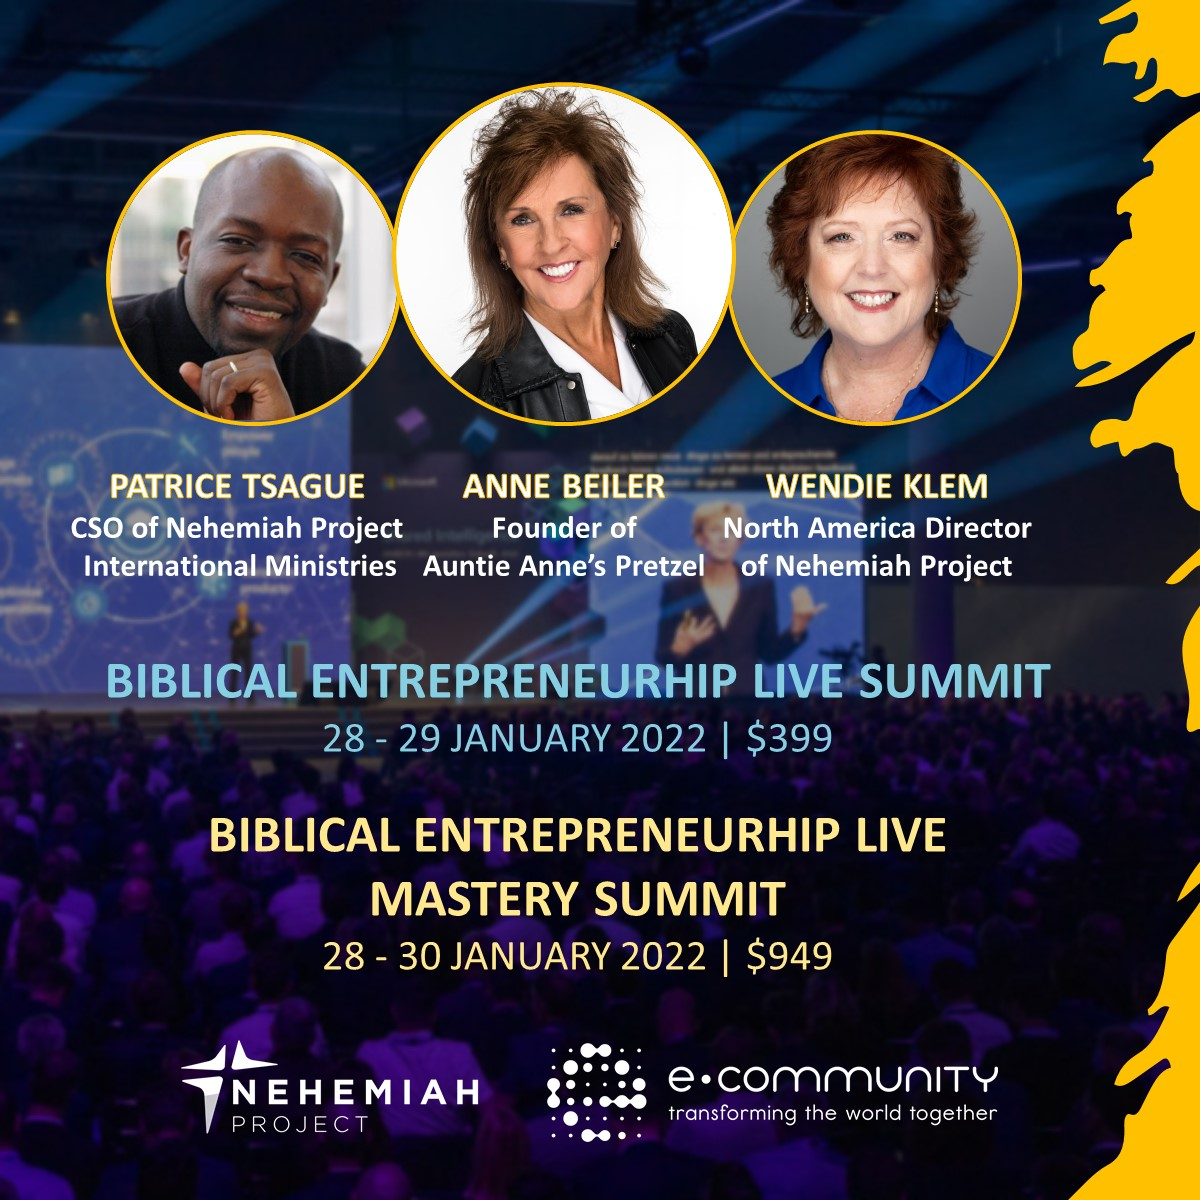 SummitnMastery Summit Promo - Nehemiah E-Community